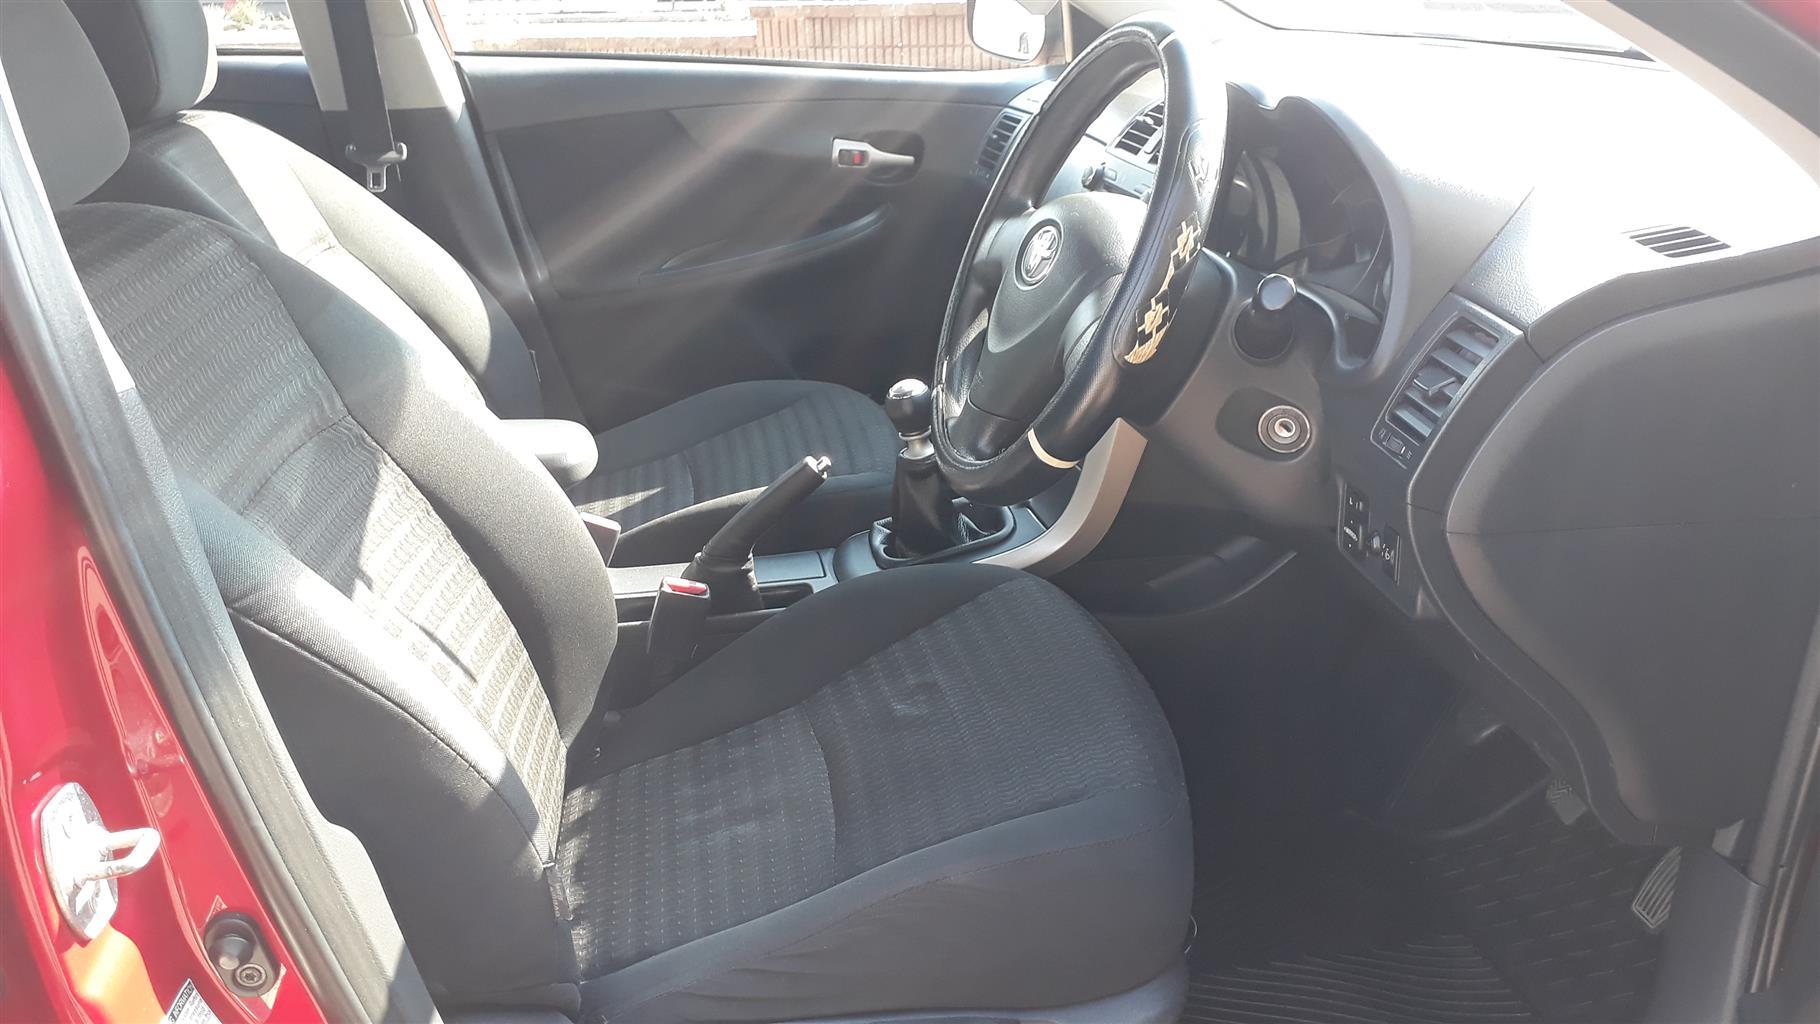 2009 Toyota Corolla 1.4 Professional